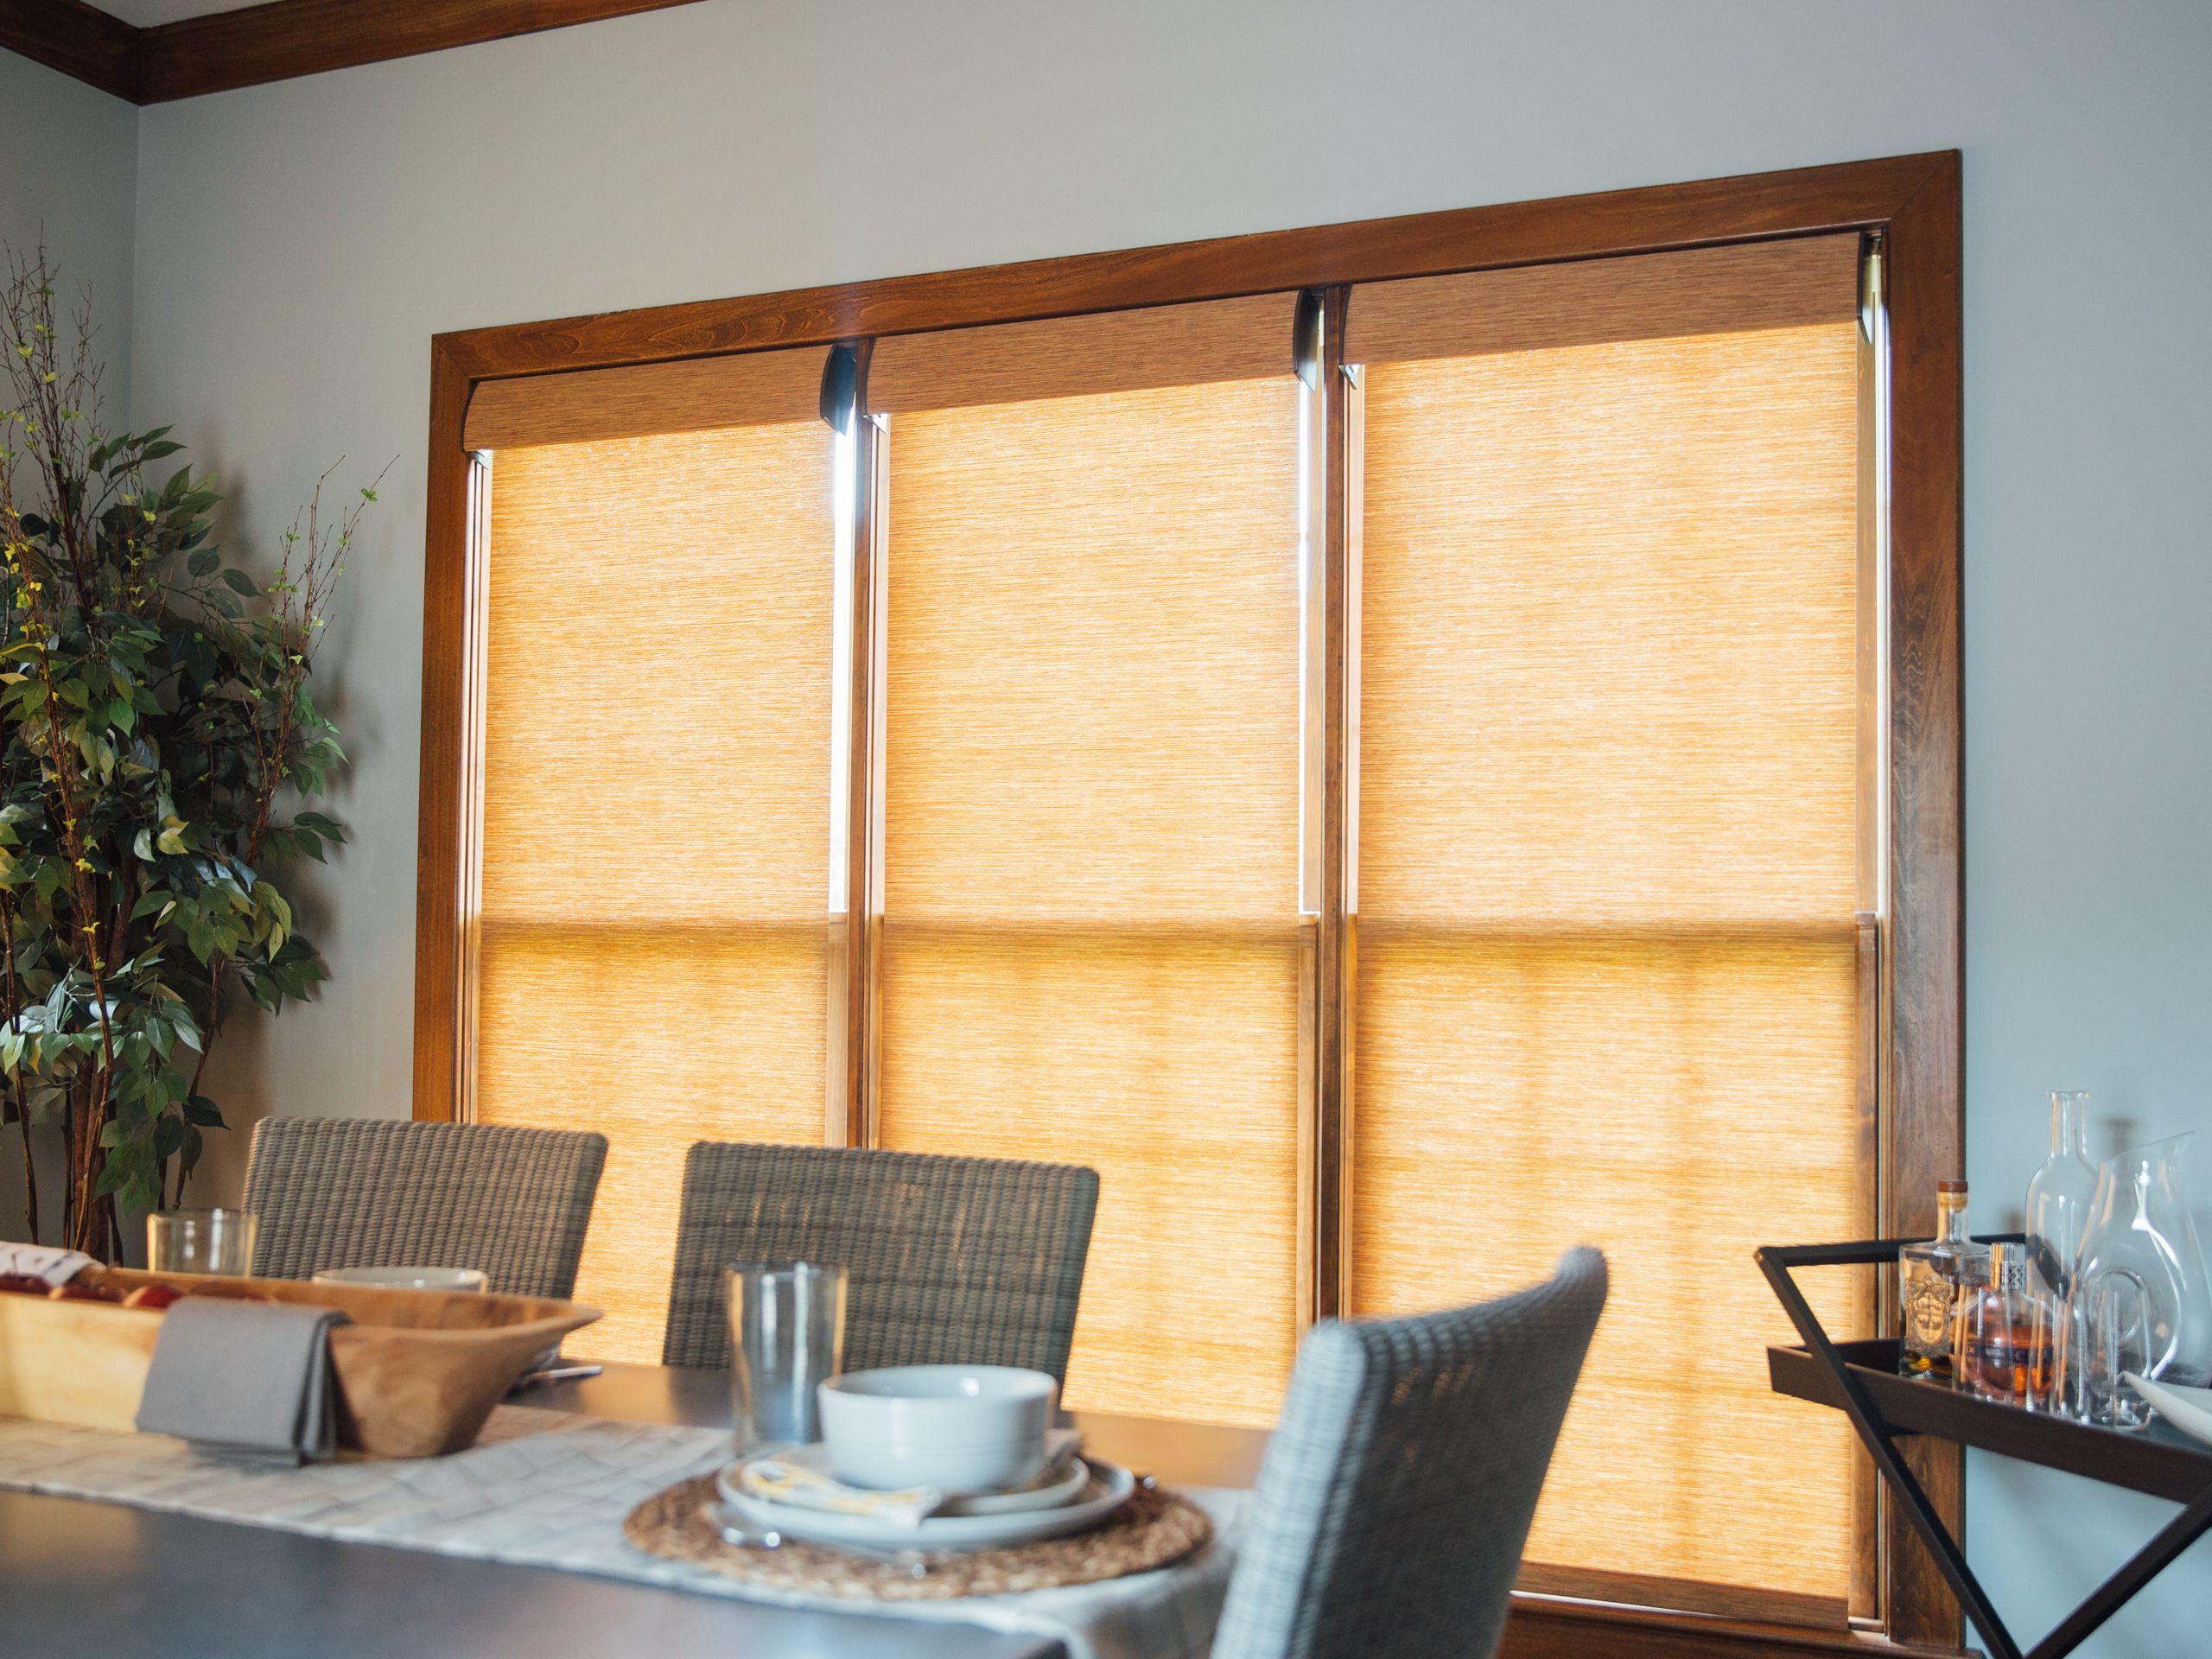 new-smart-home-lutron-serena-shades-15.jpg